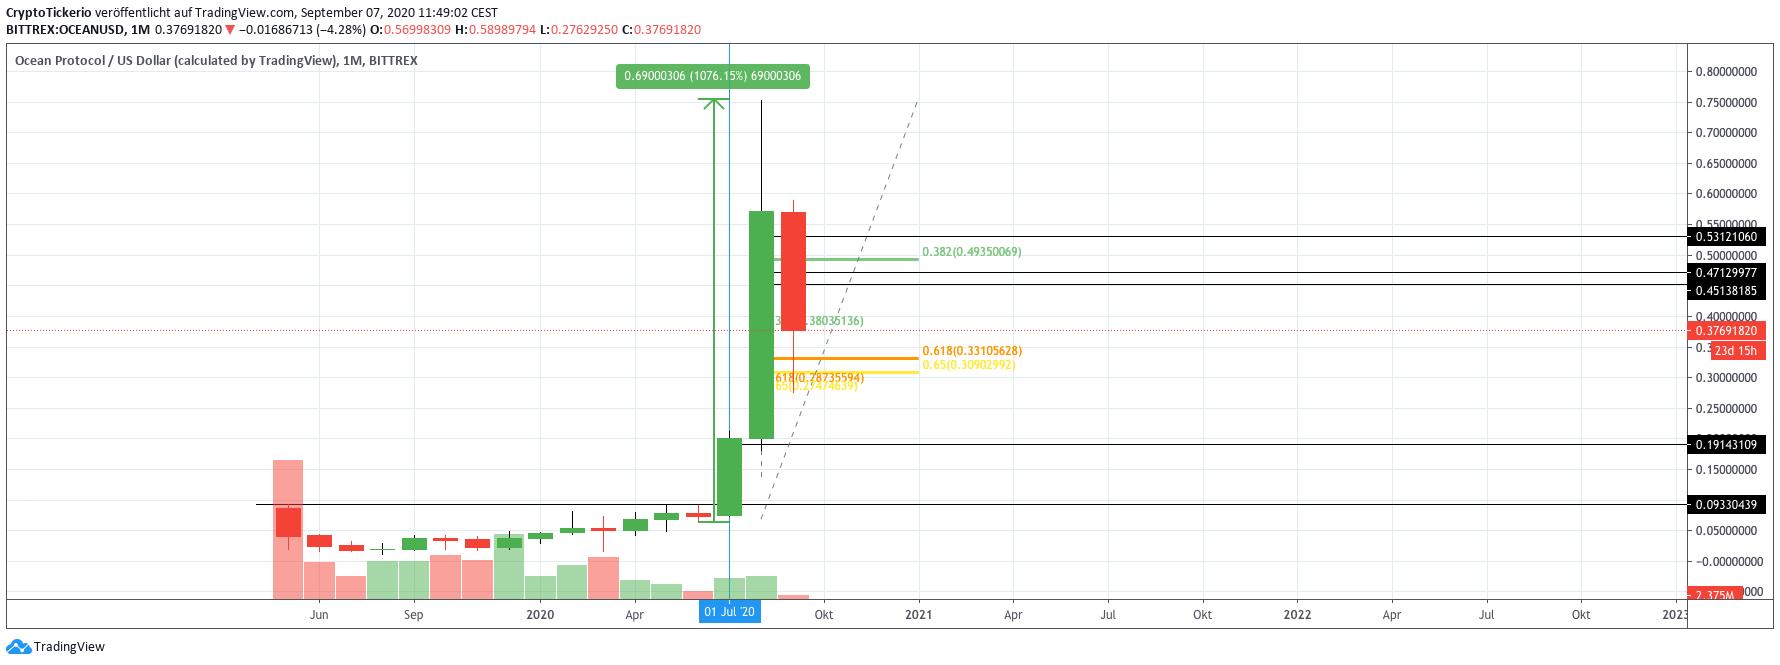 OCEAN/USD monthly price chart